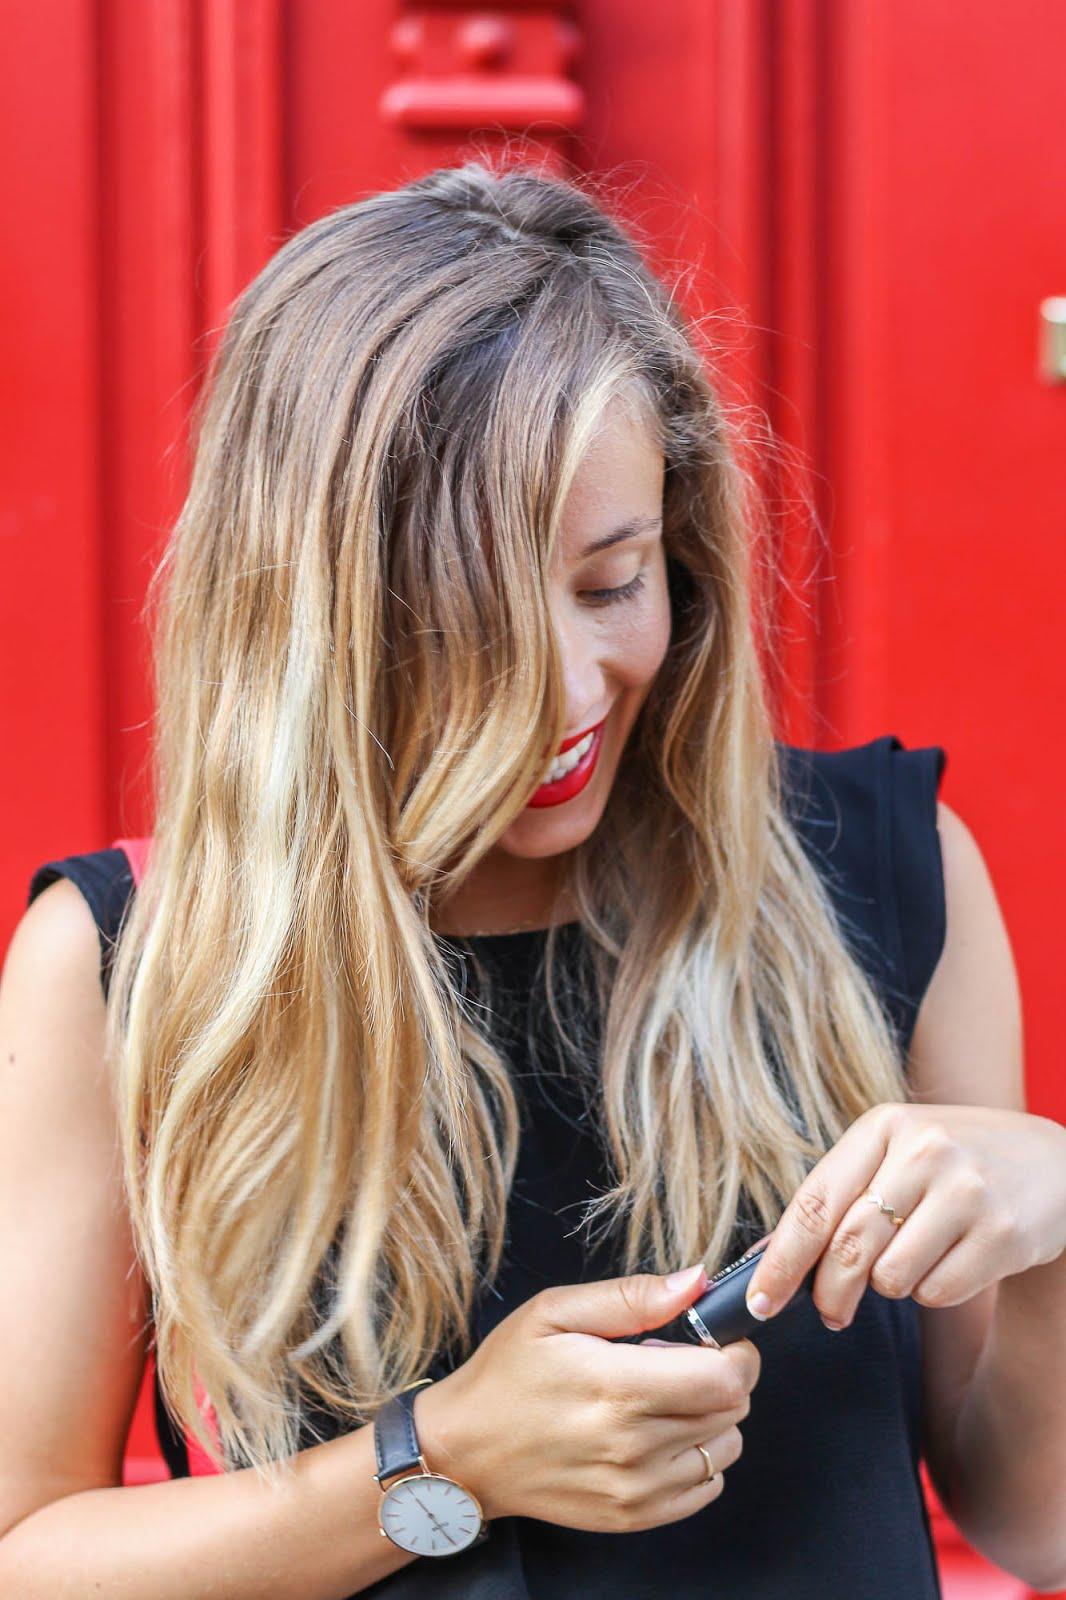 Blog mode lifestyle Le rouge Givenchy